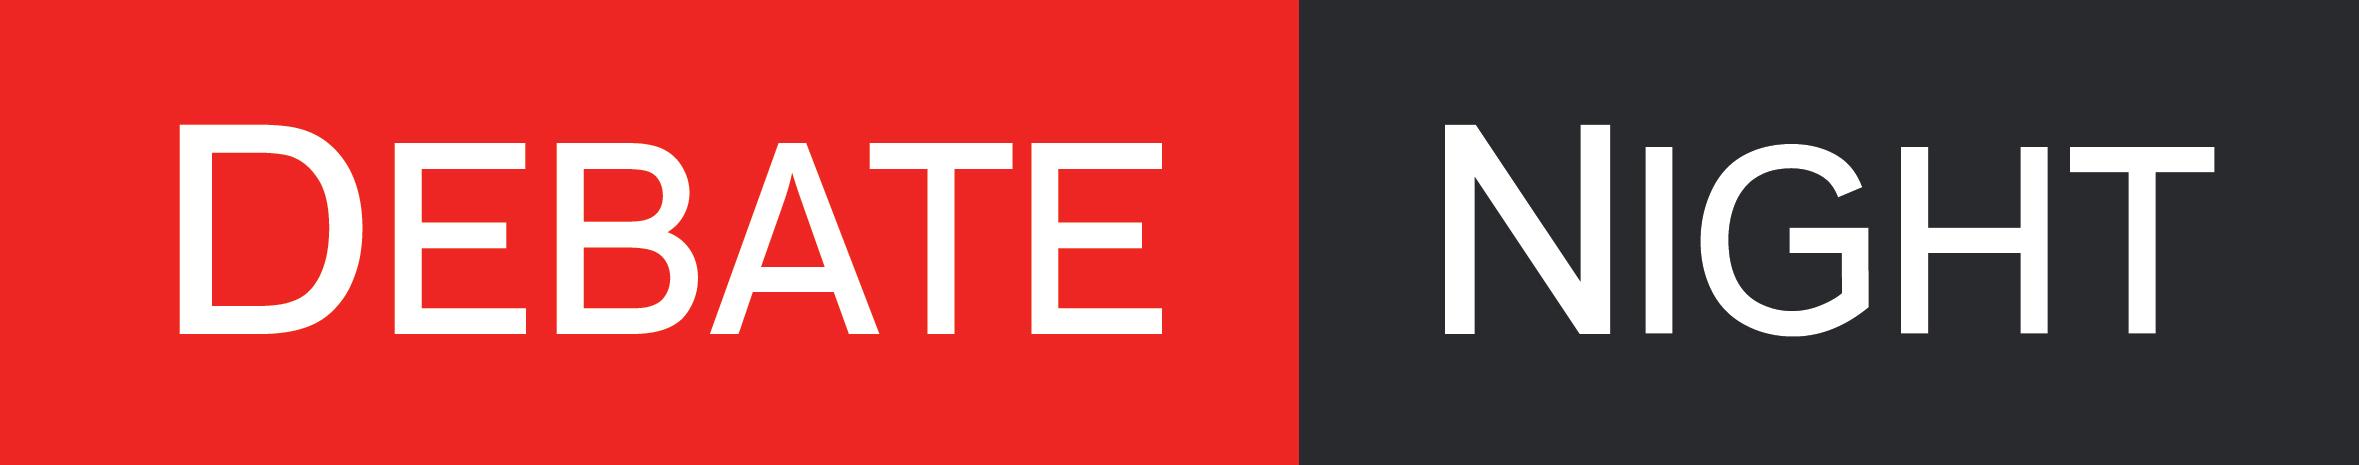 DN logo jpg